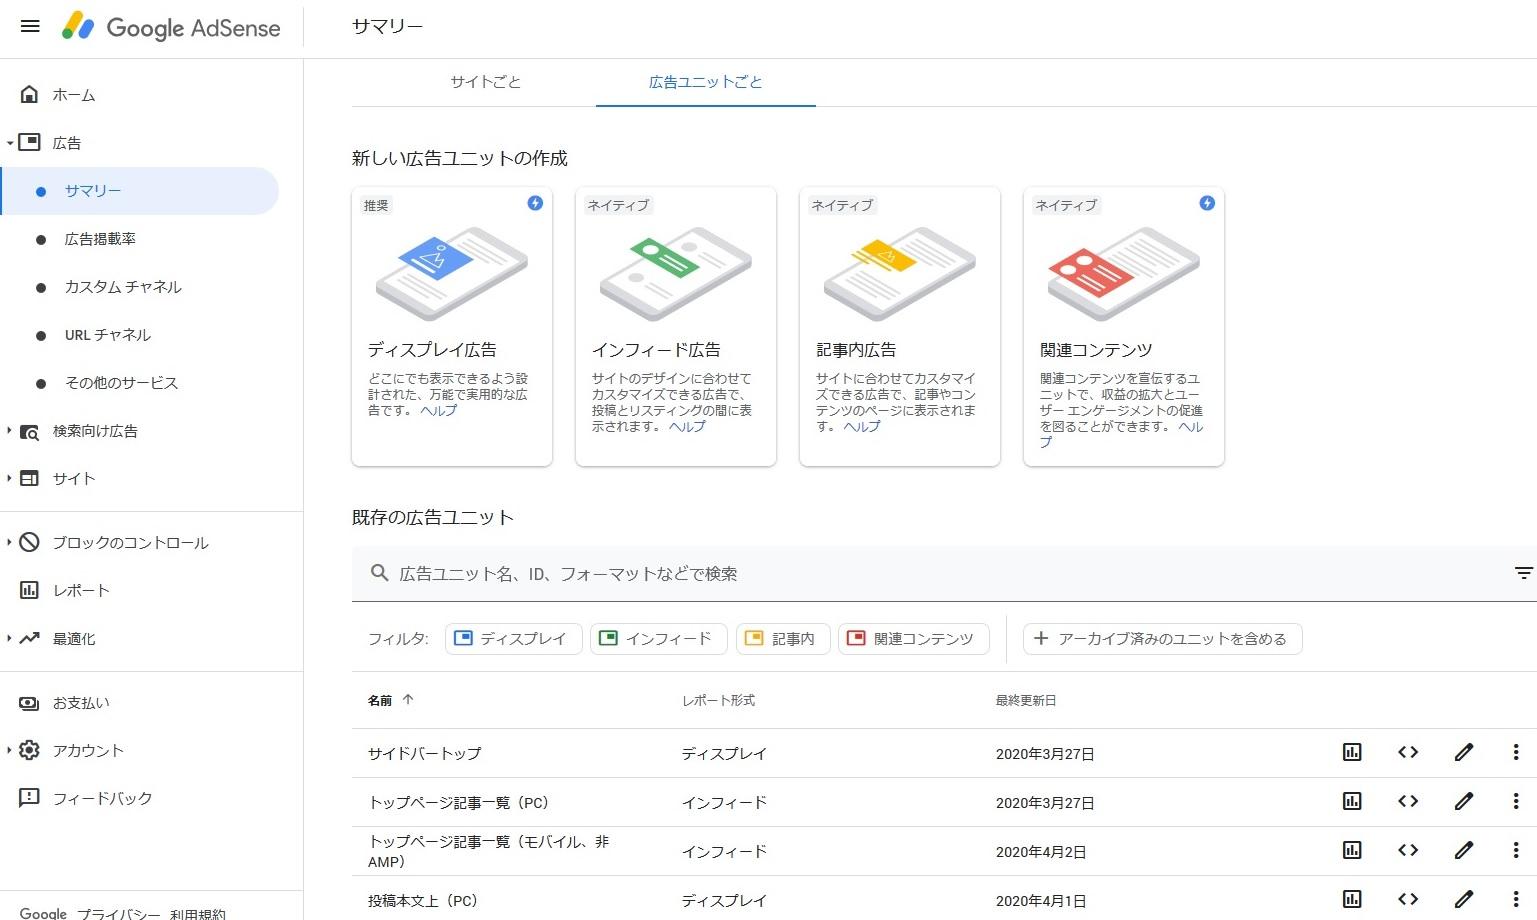 Googleアドセンス管理画面、広告>サマリー>広告ユニットごと